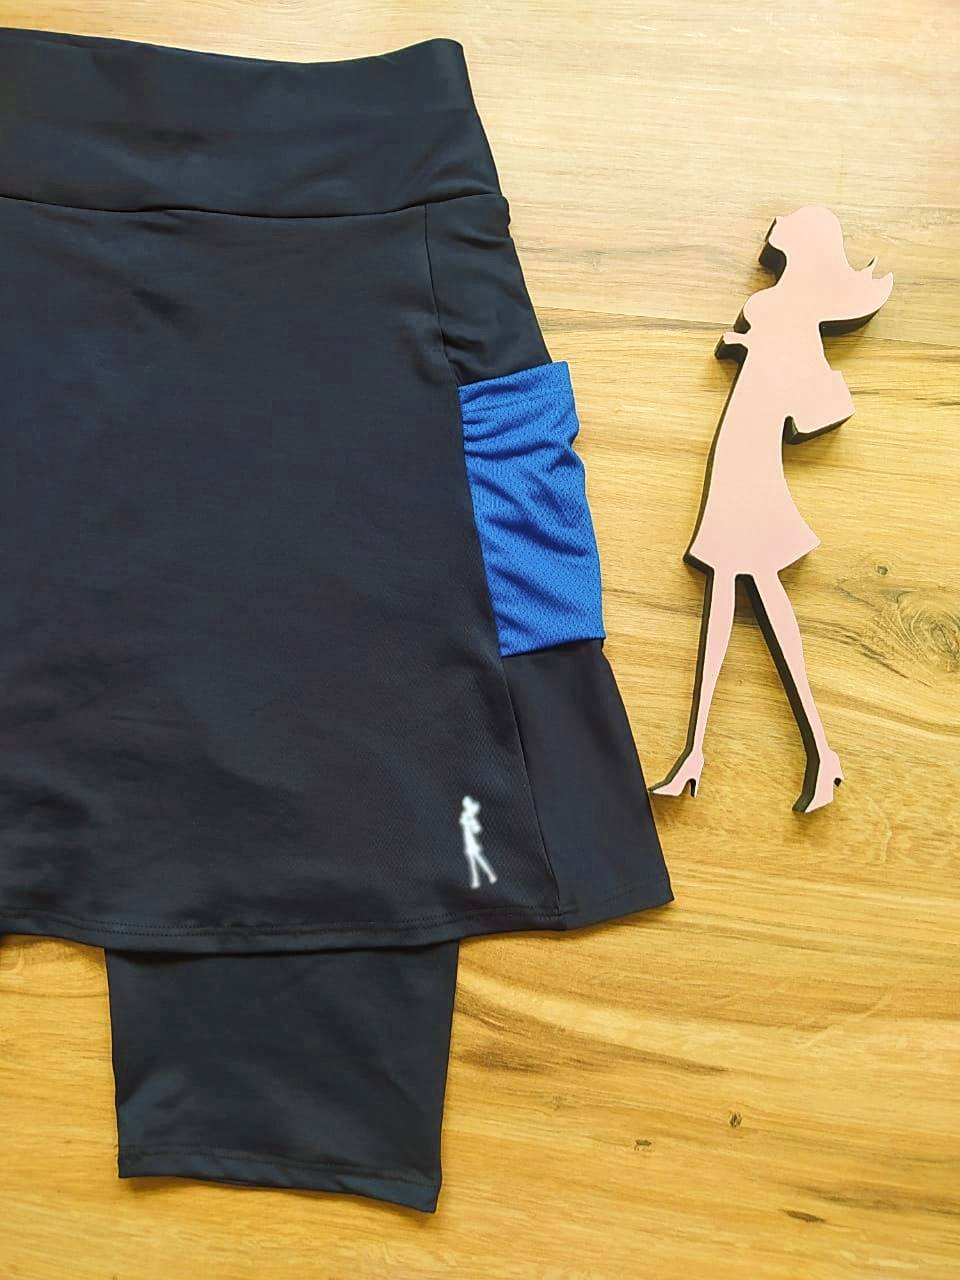 Saia Bermuda Nina - Esporte Fitness Saia Bela - SBF004 - Preto e Azul